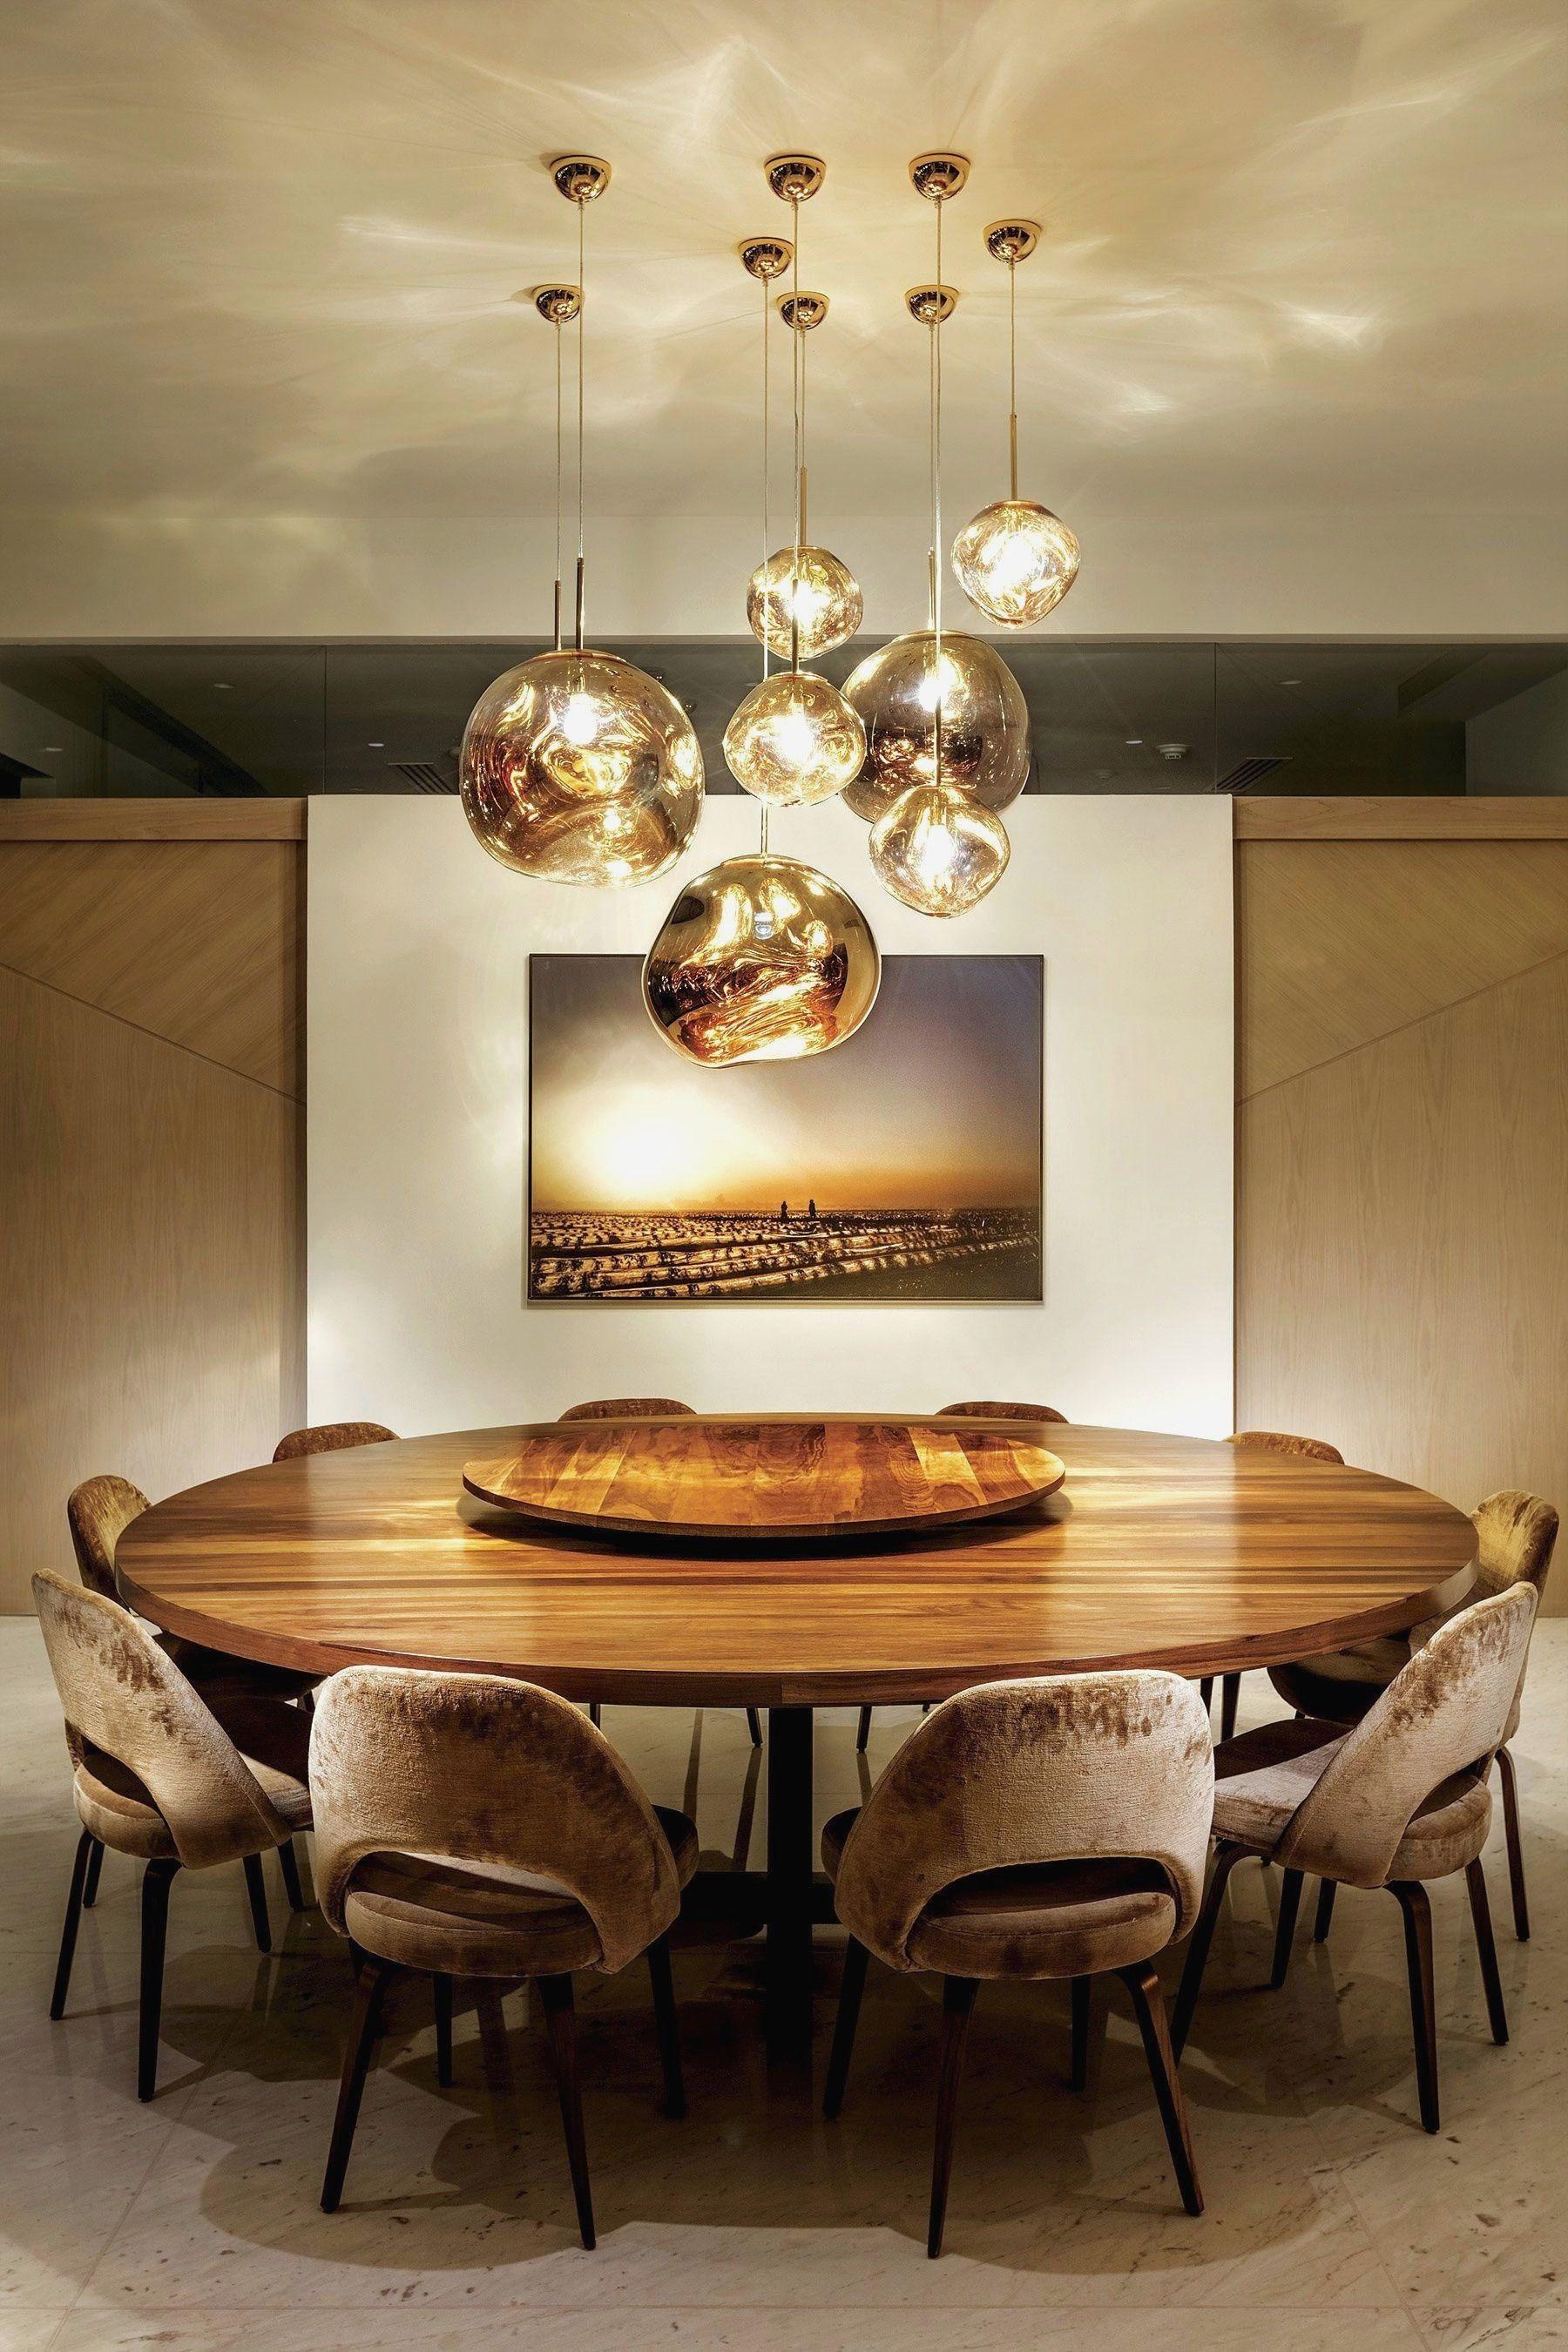 8 Fresh Shaker Style Bedroom Foyer Wallpaper Ideas Wonderful Decoration Ideas Best On Design Round Dining Room Dining Room Table Decor Modern Dining Room